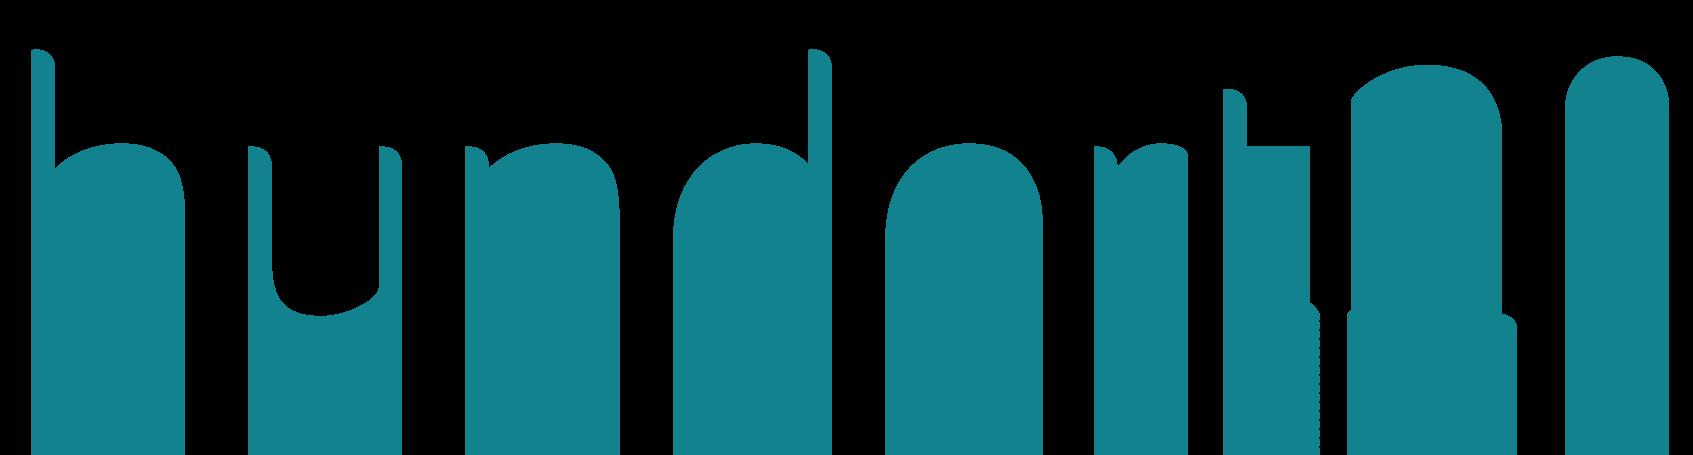 hundert2grad logo